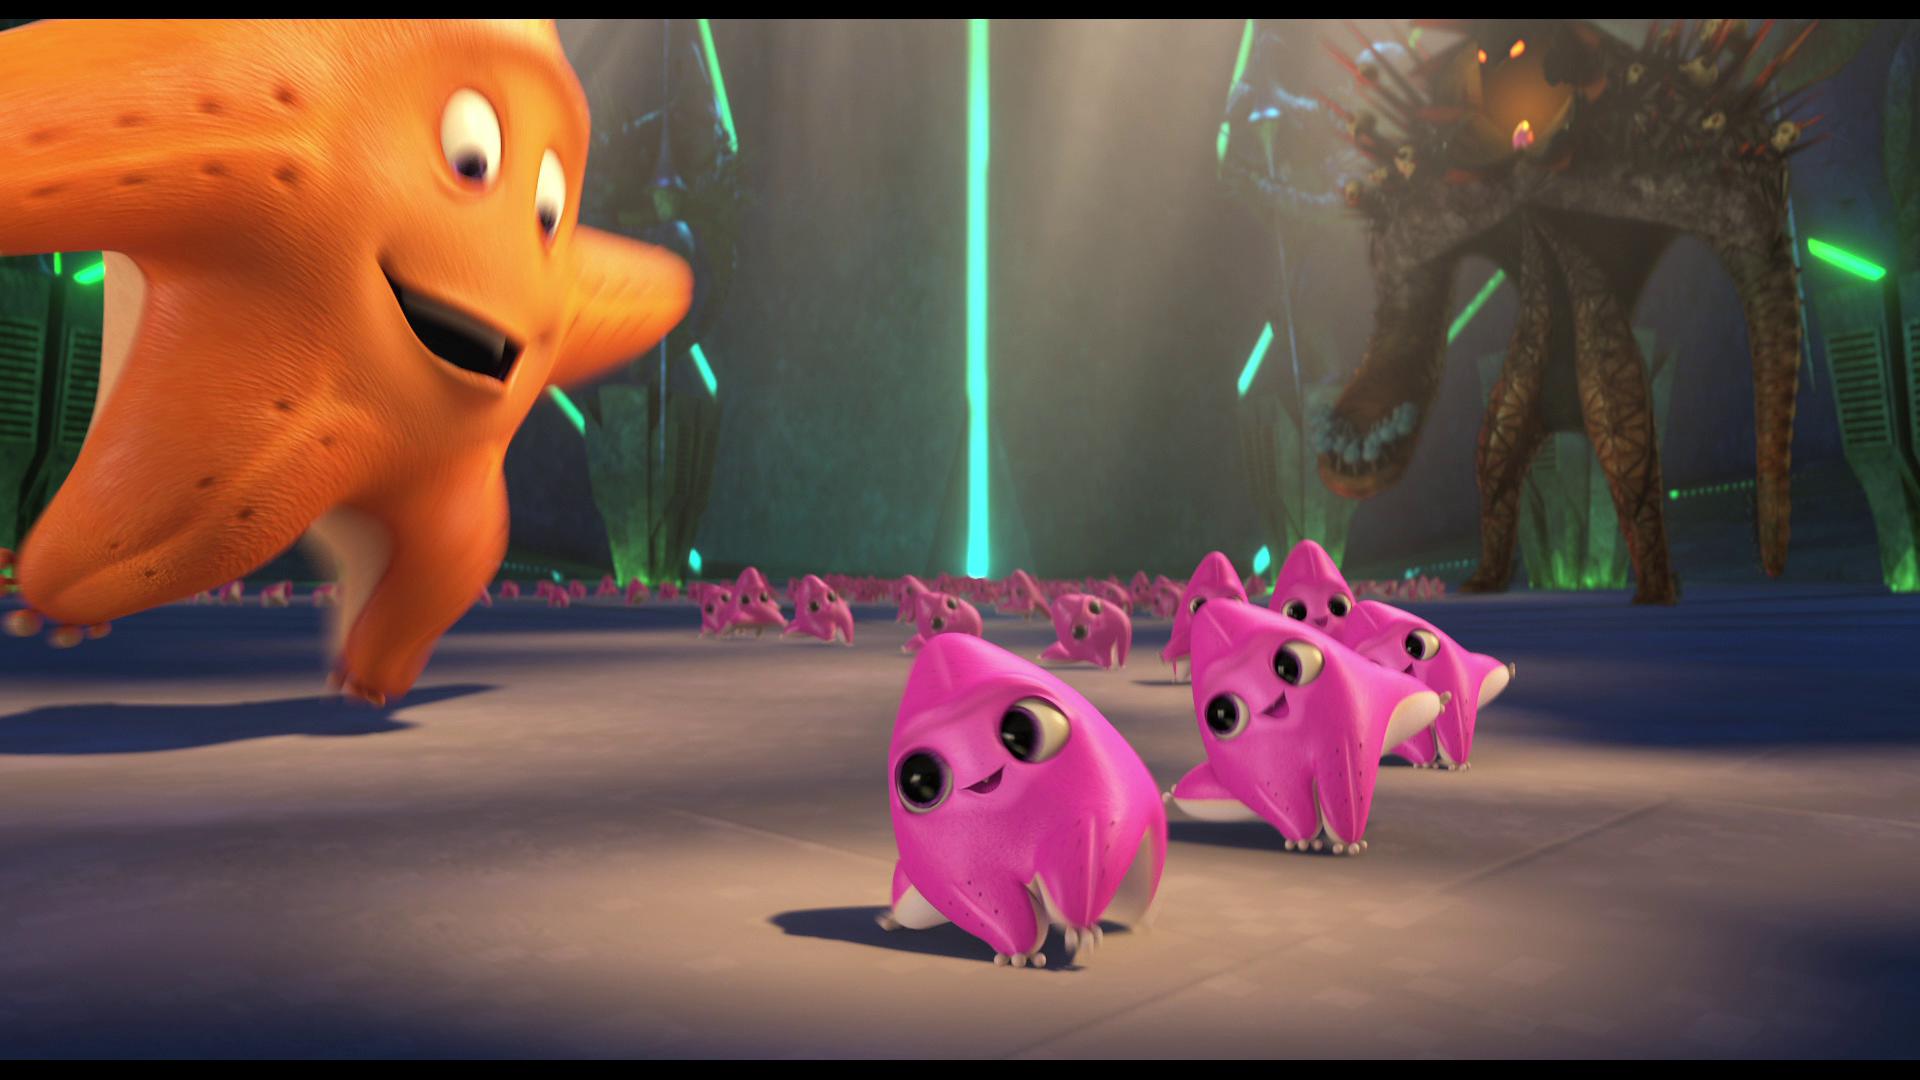 3d animation alien invasion 1 - 4 8